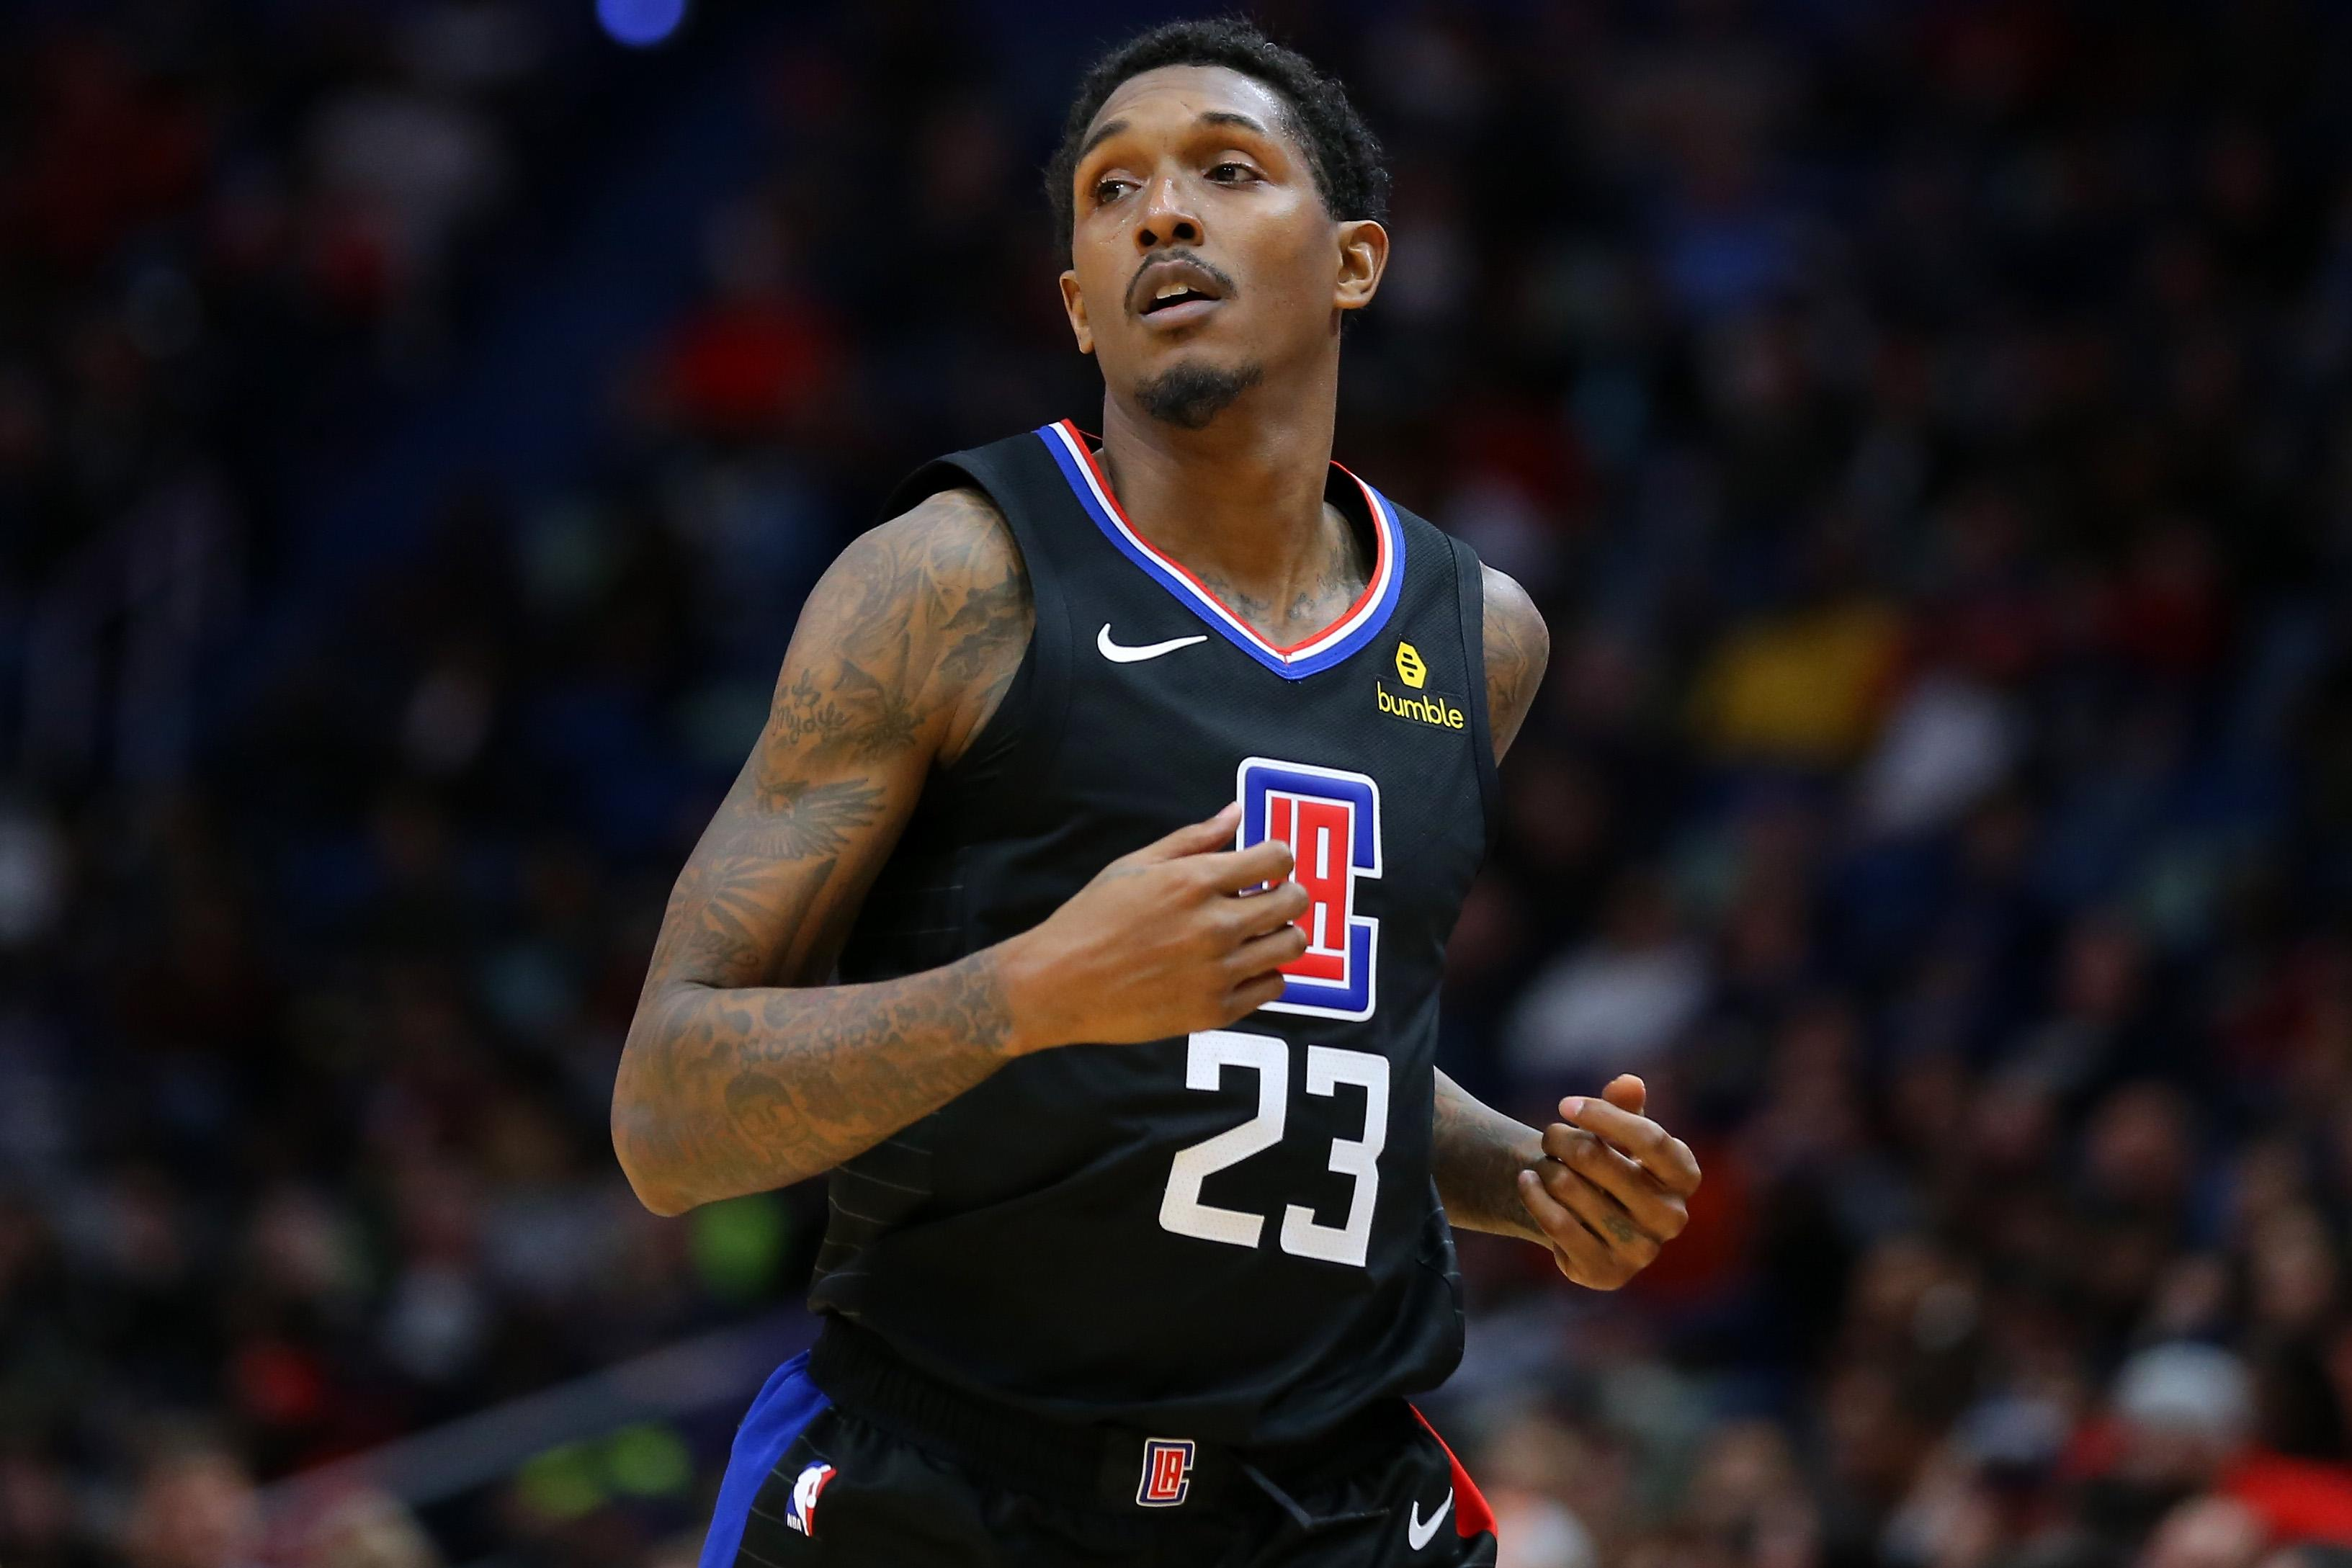 2019 Yahoo Fantasy Basketball Week 5 Start 'Em, Sit 'Em and schedule breakdown